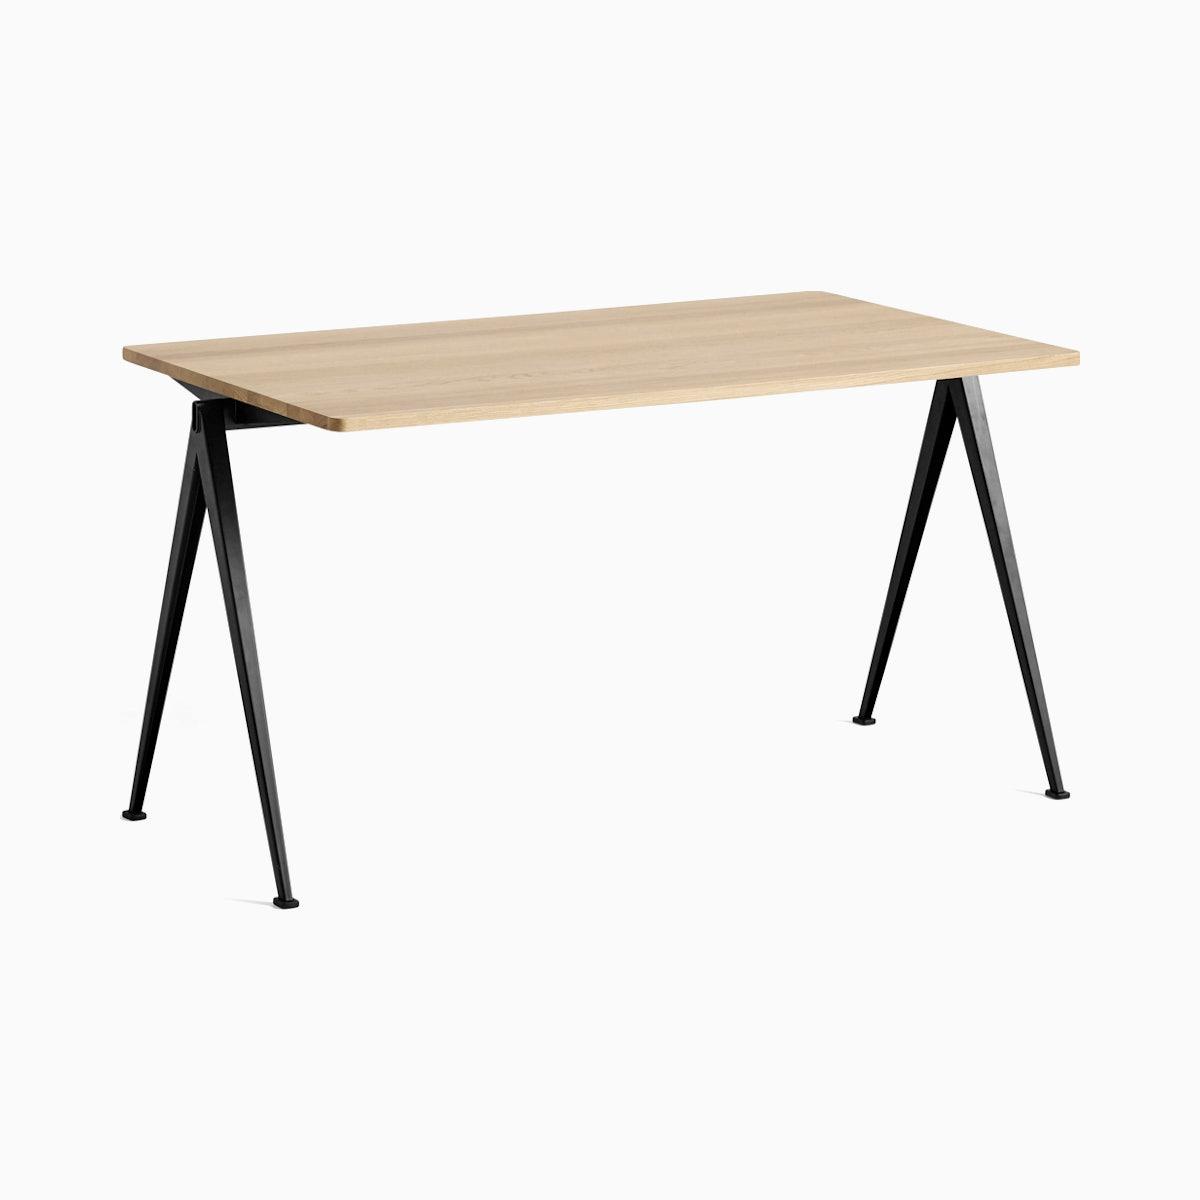 Pyramid Table 01 - Desk